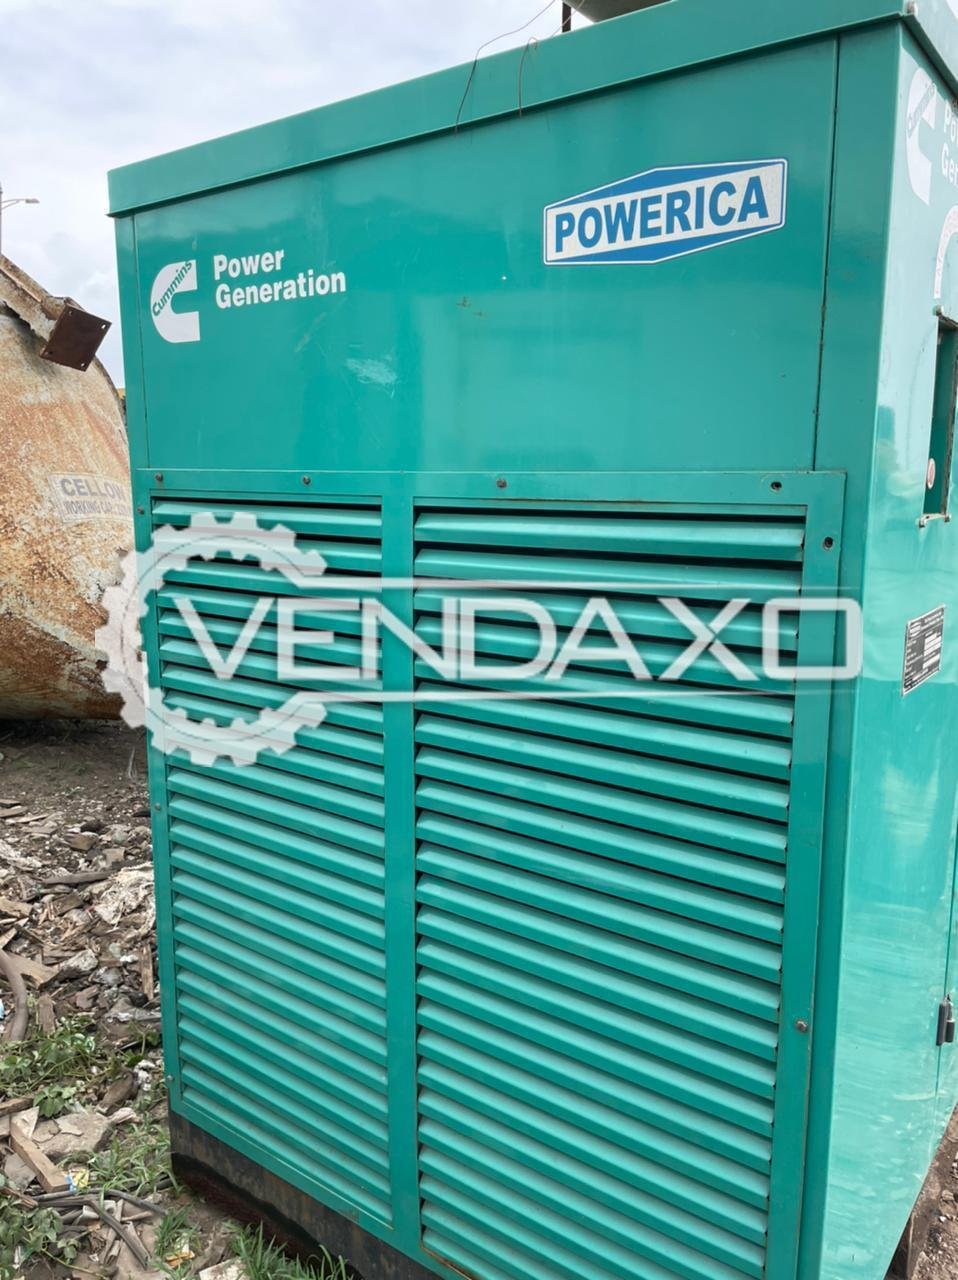 Cummins Powerica Diesel Generator - 125 Kva